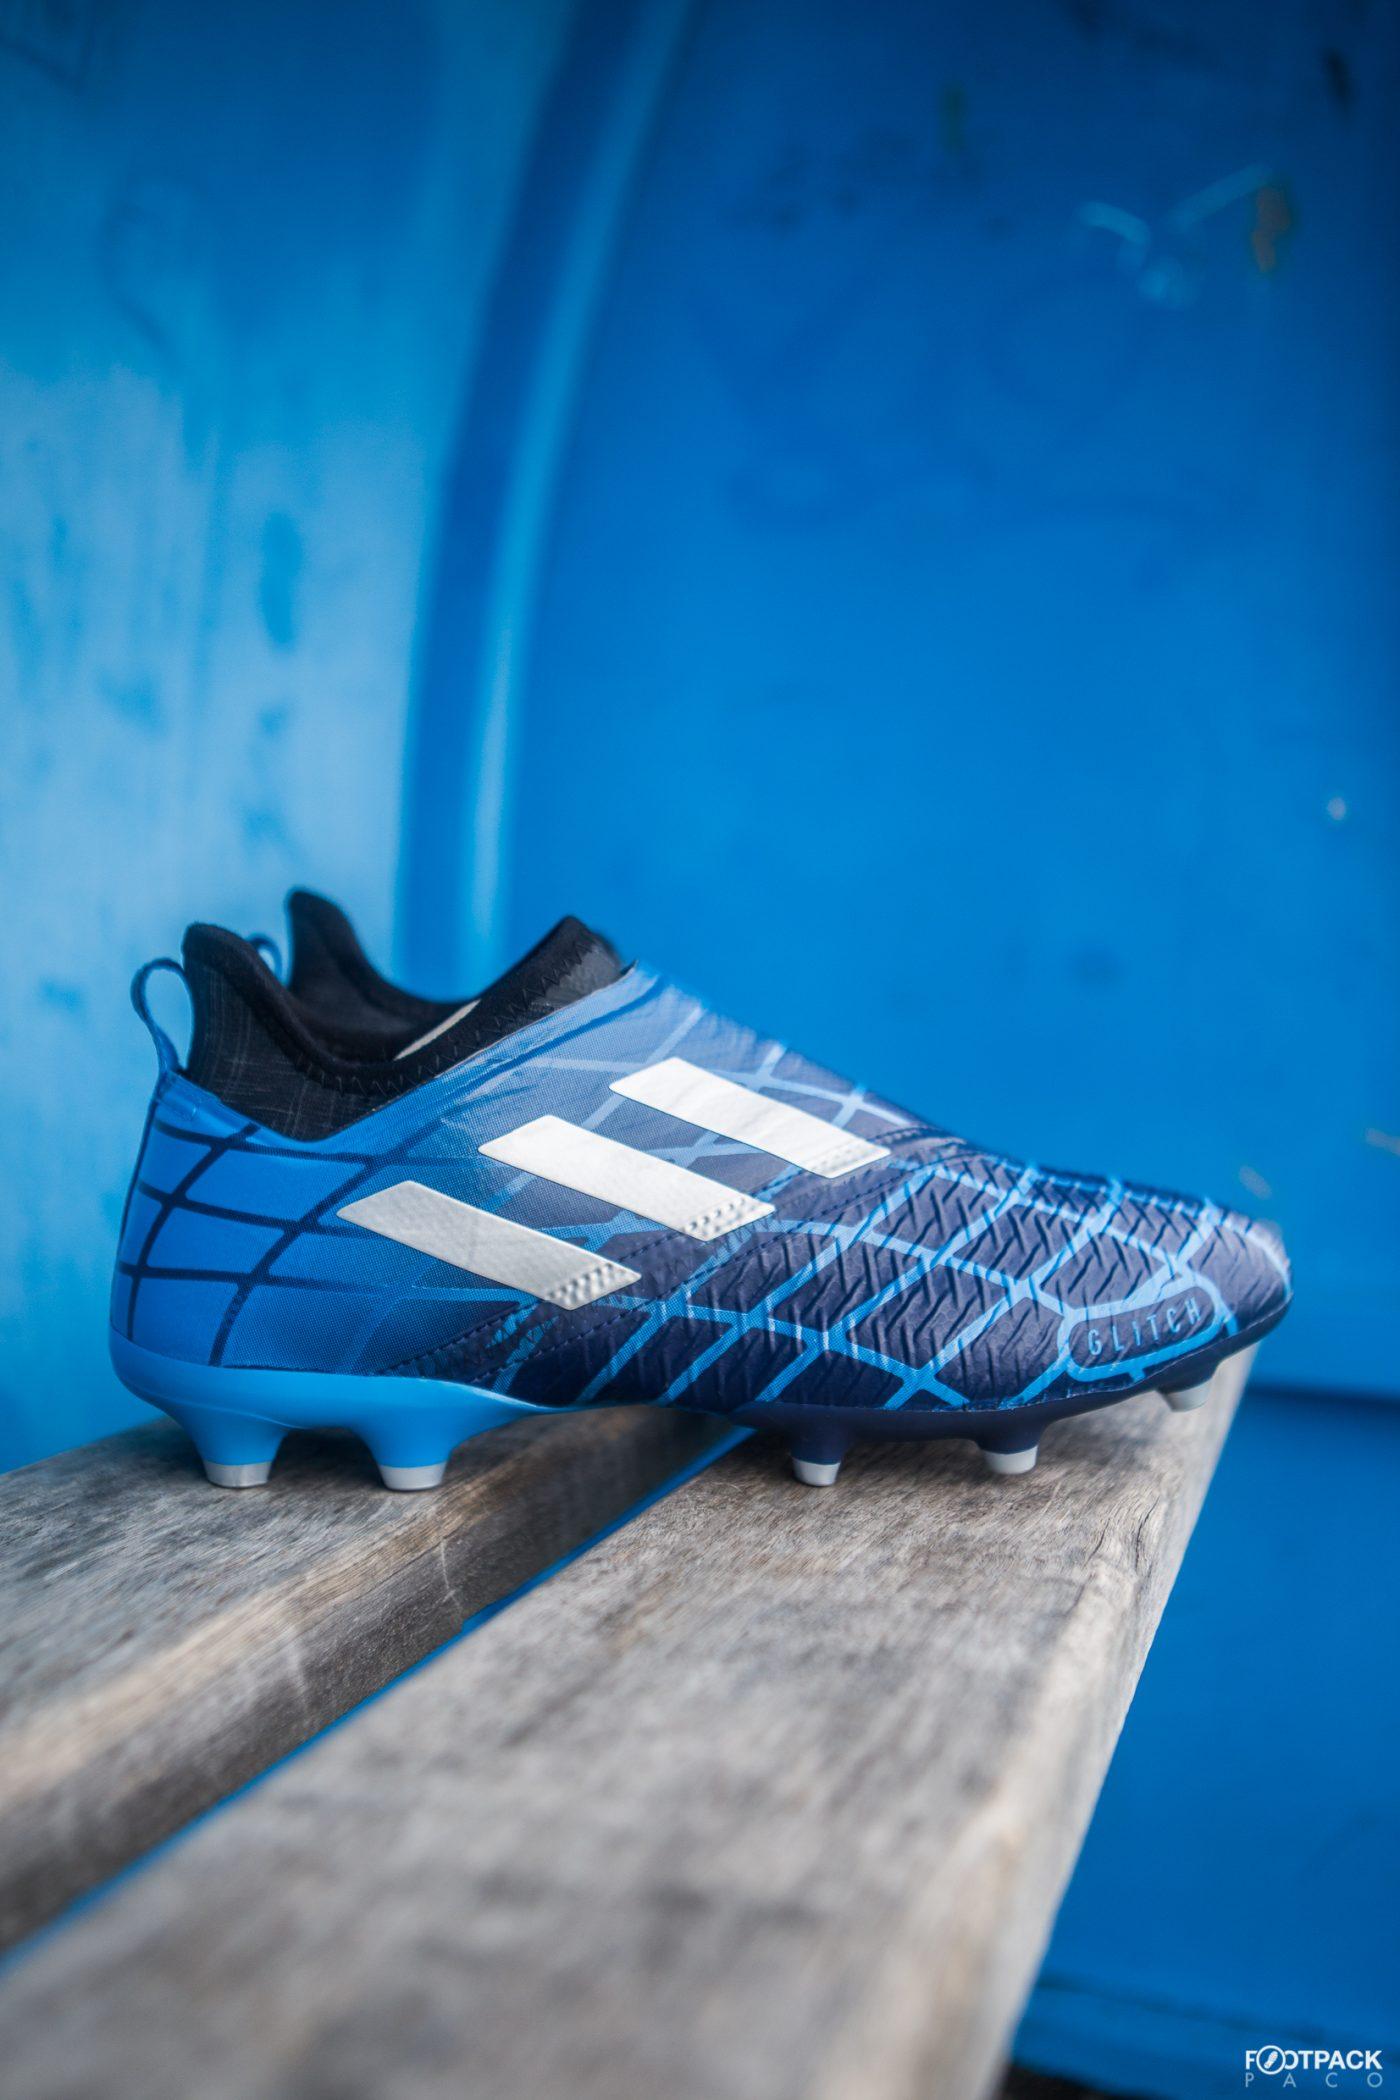 adidas-glitch-classic-pack-skin-F50-araignee-2005-footpack-